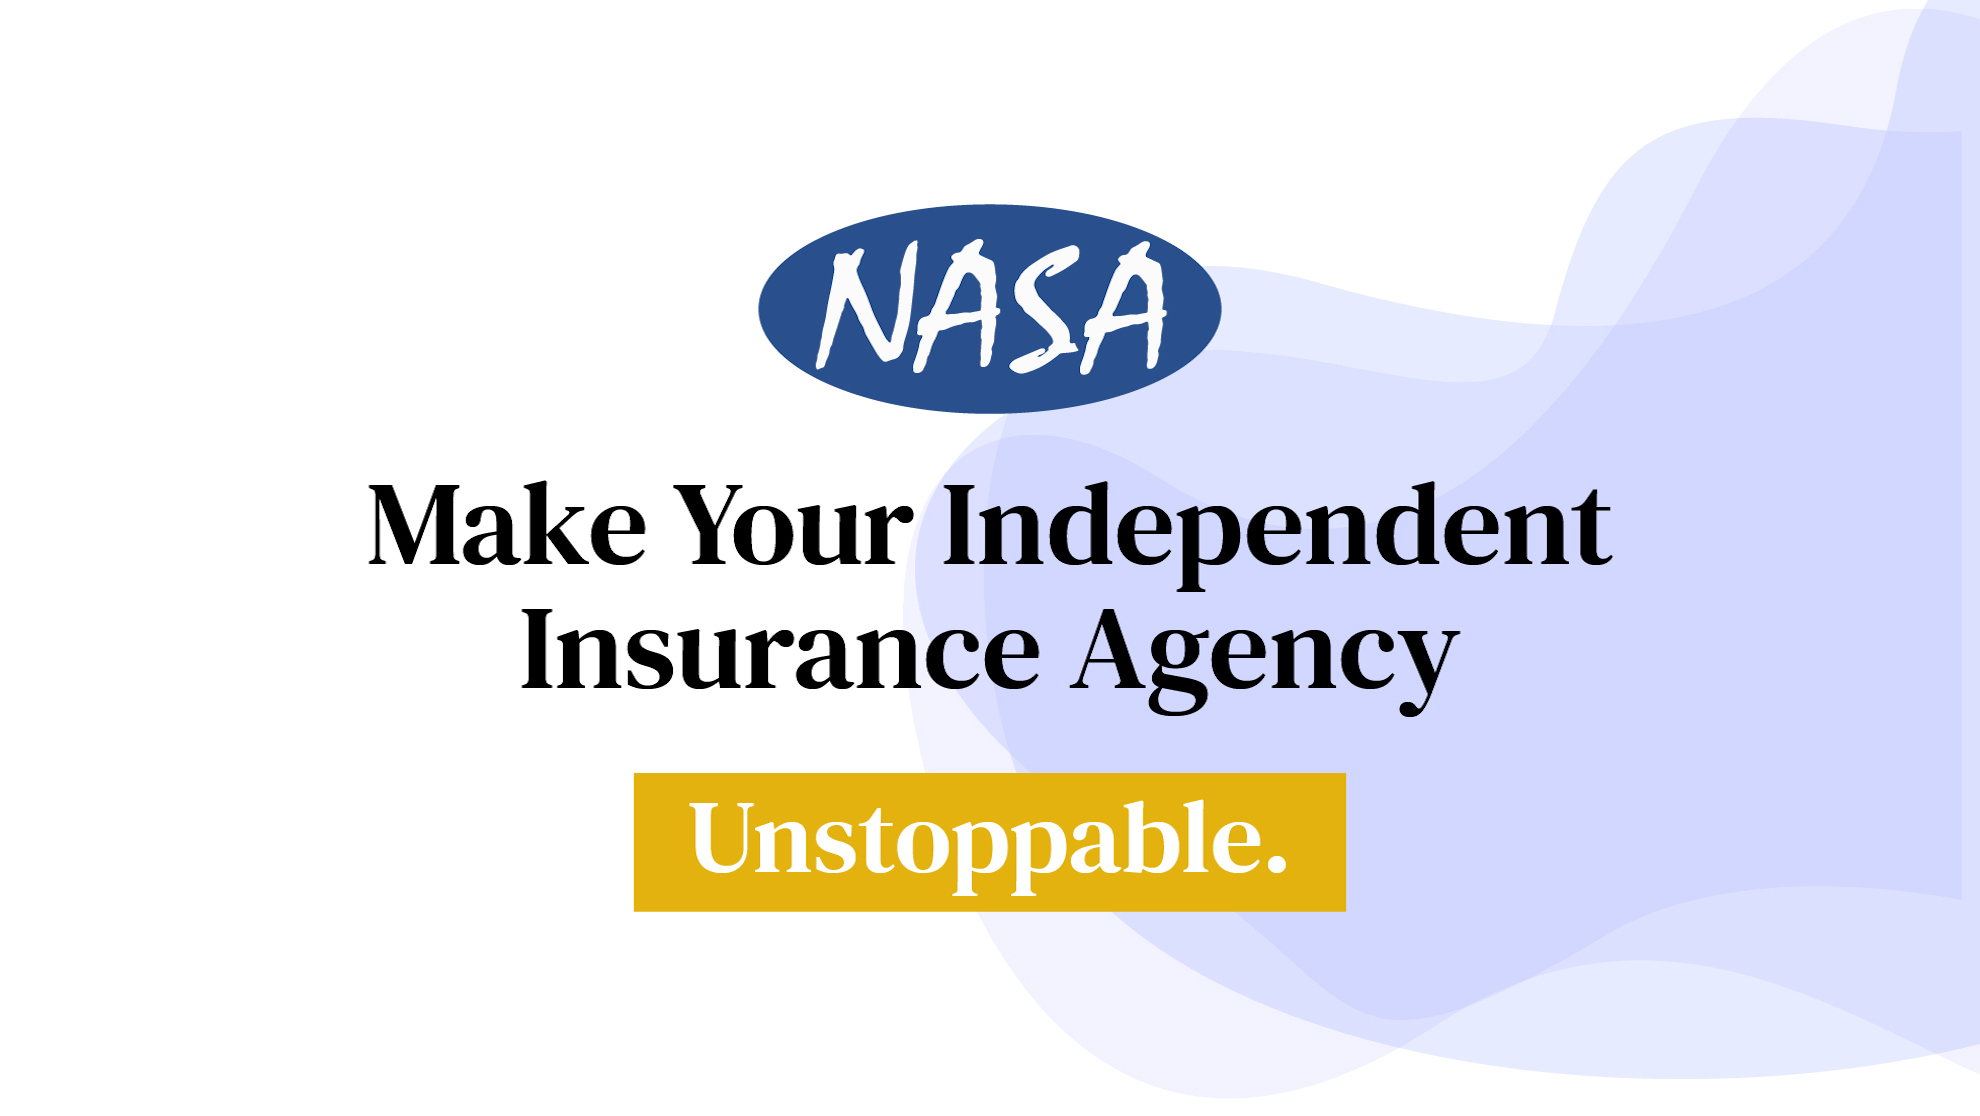 NASA-Animated-Video-05-24-21-2